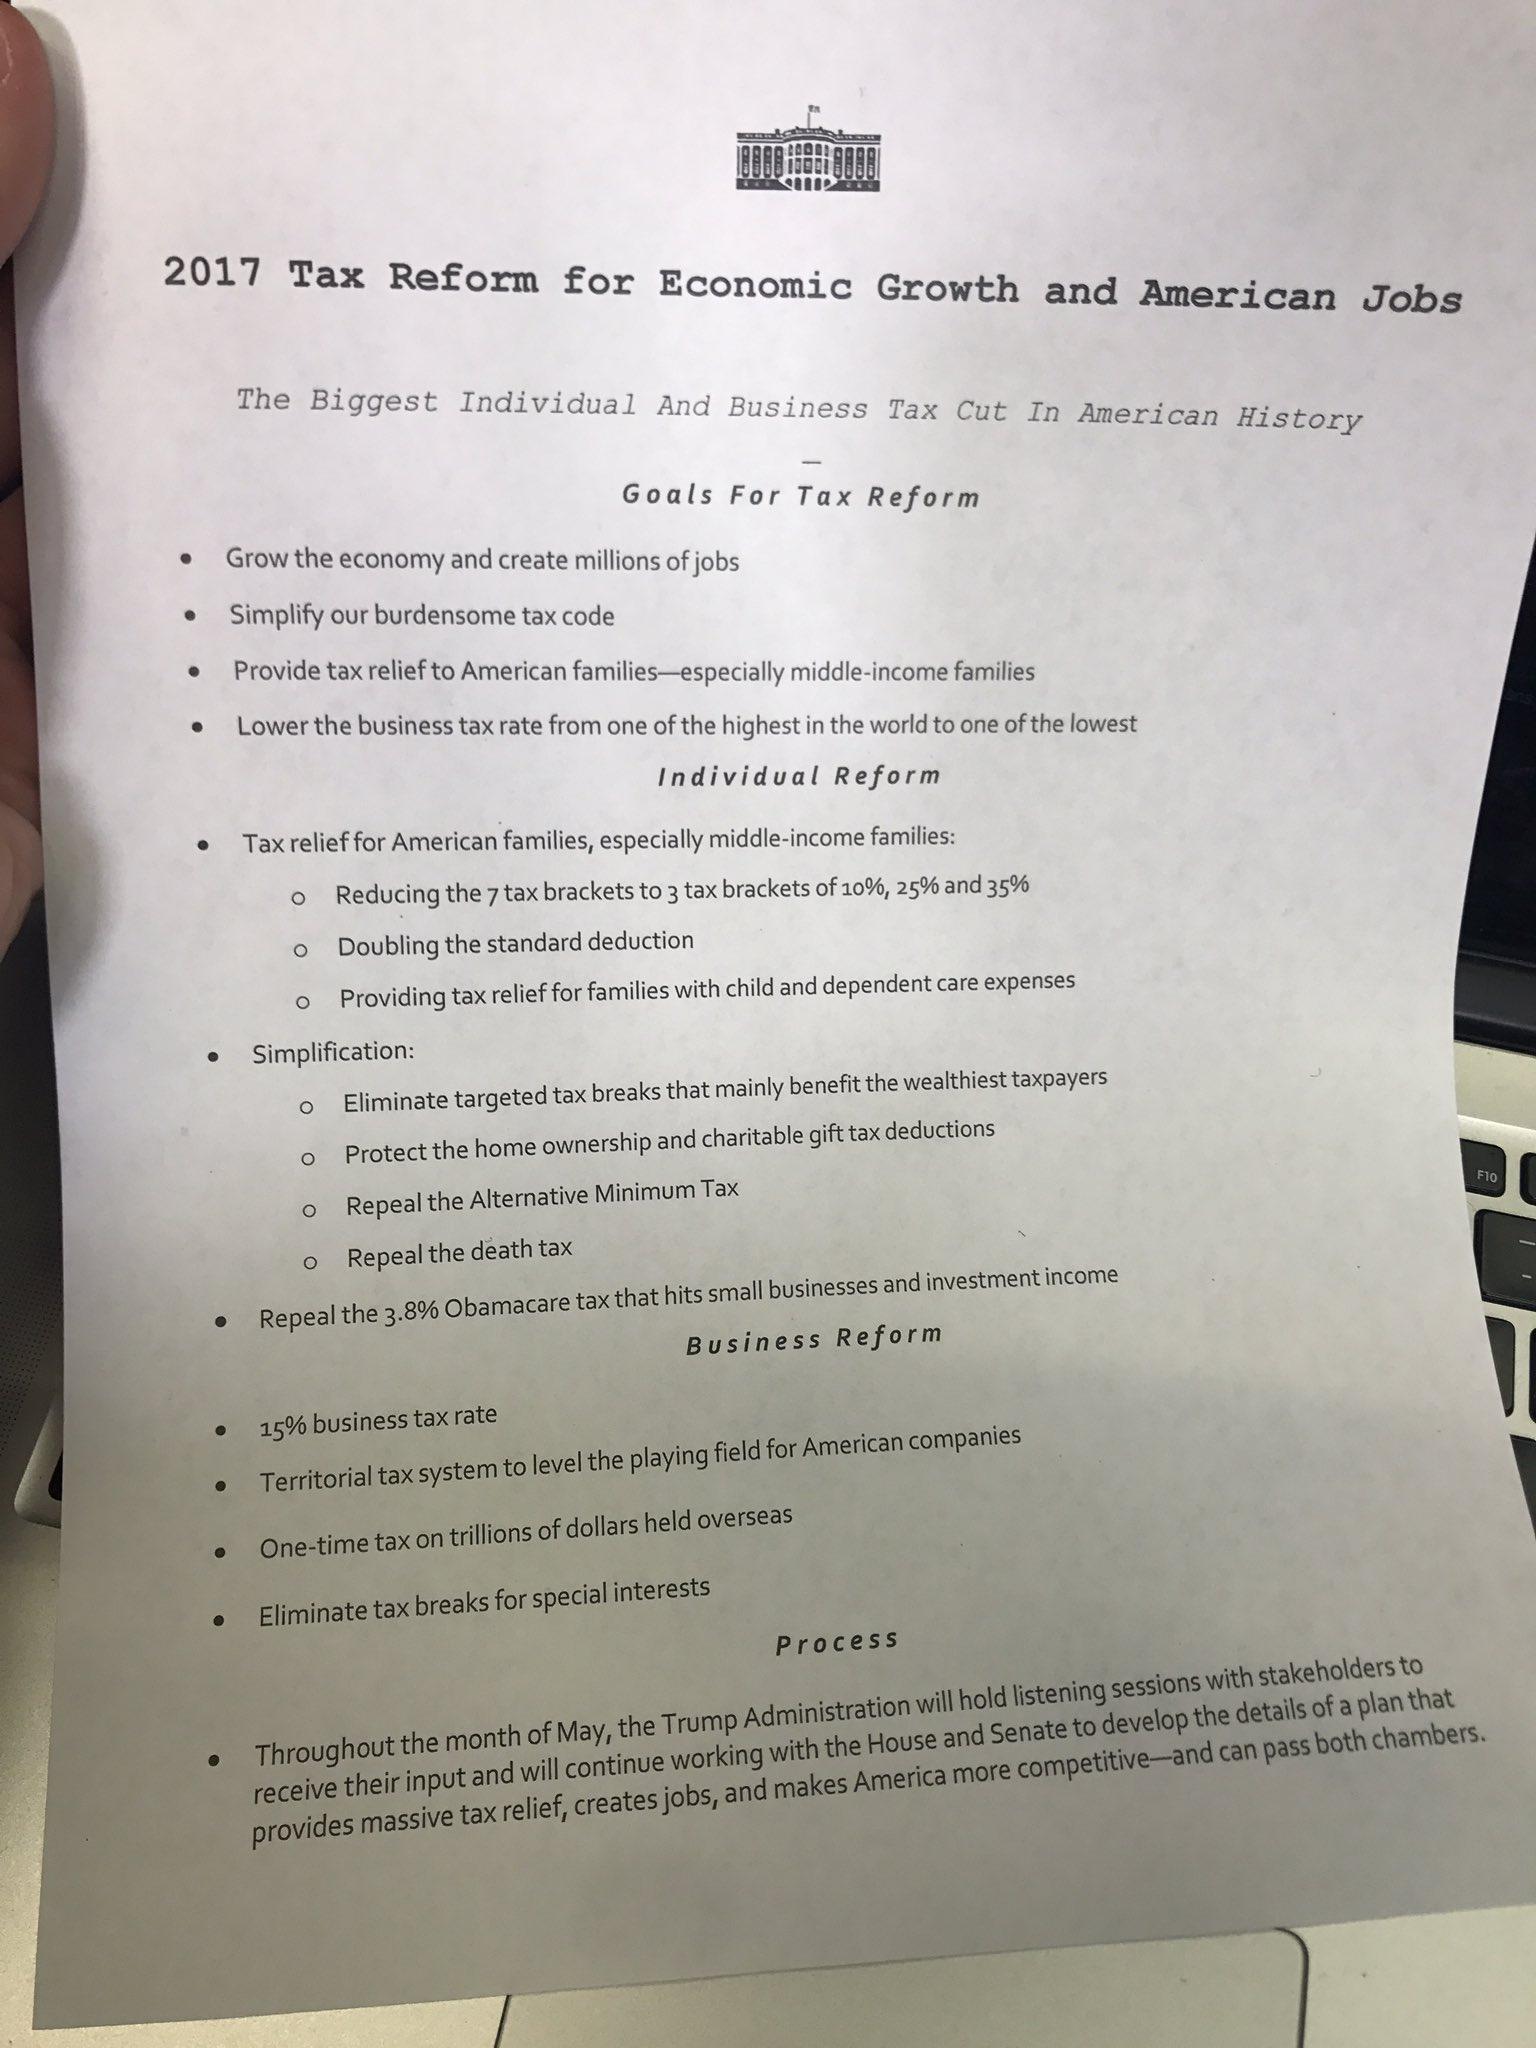 The @WhiteHouse tax plan: https://t.co/l7xag1dE4Q